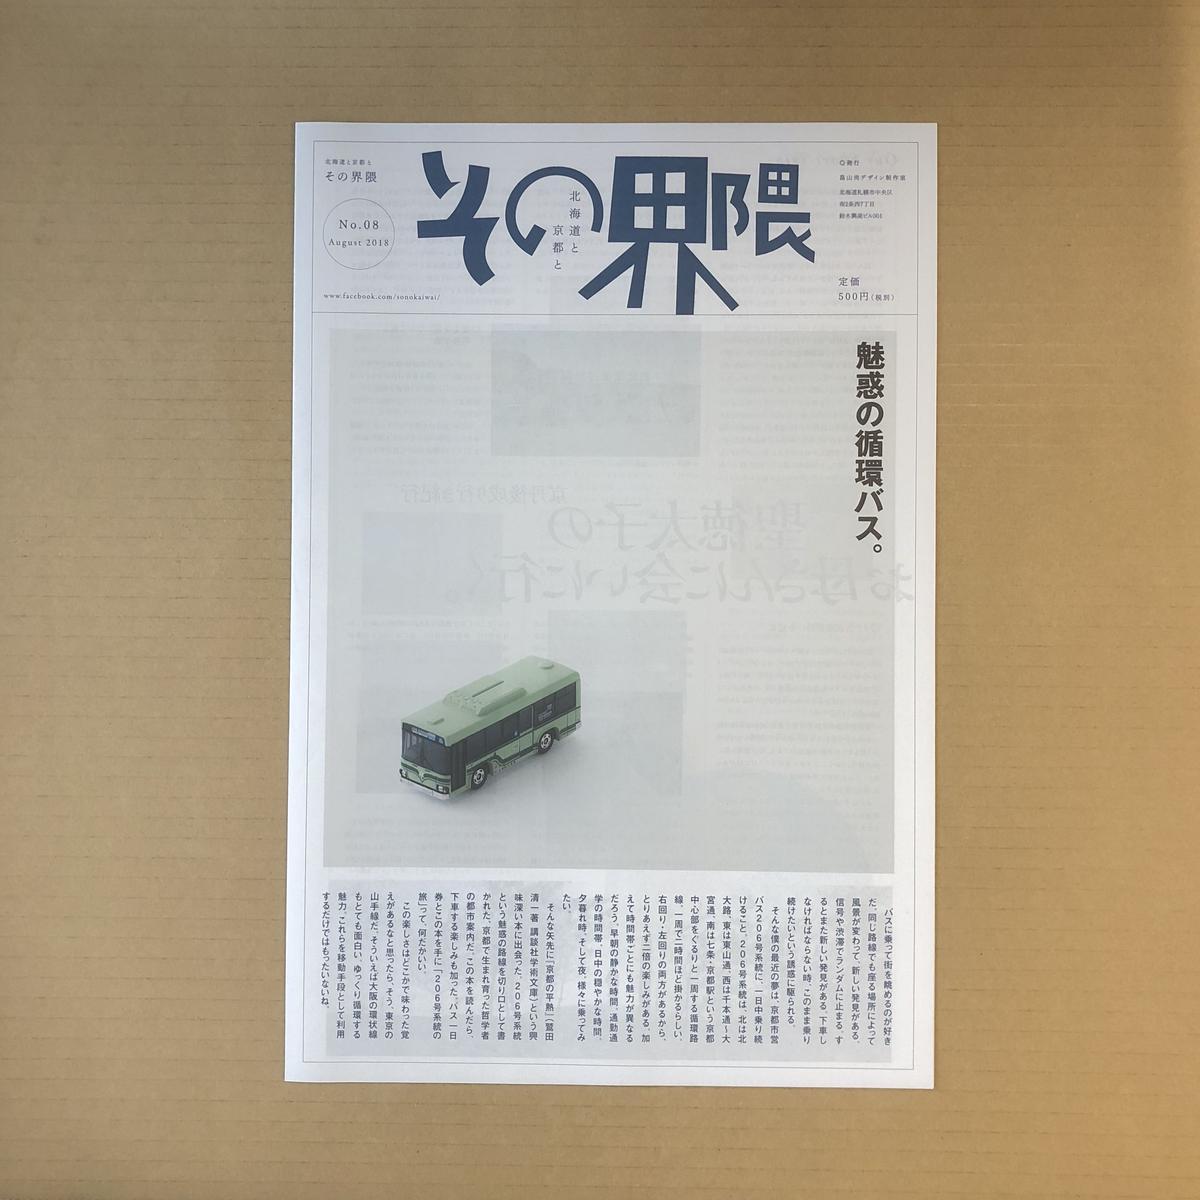 ng-non-bindable>北海道と京都と その界隈   第8号 | HH DESIGN